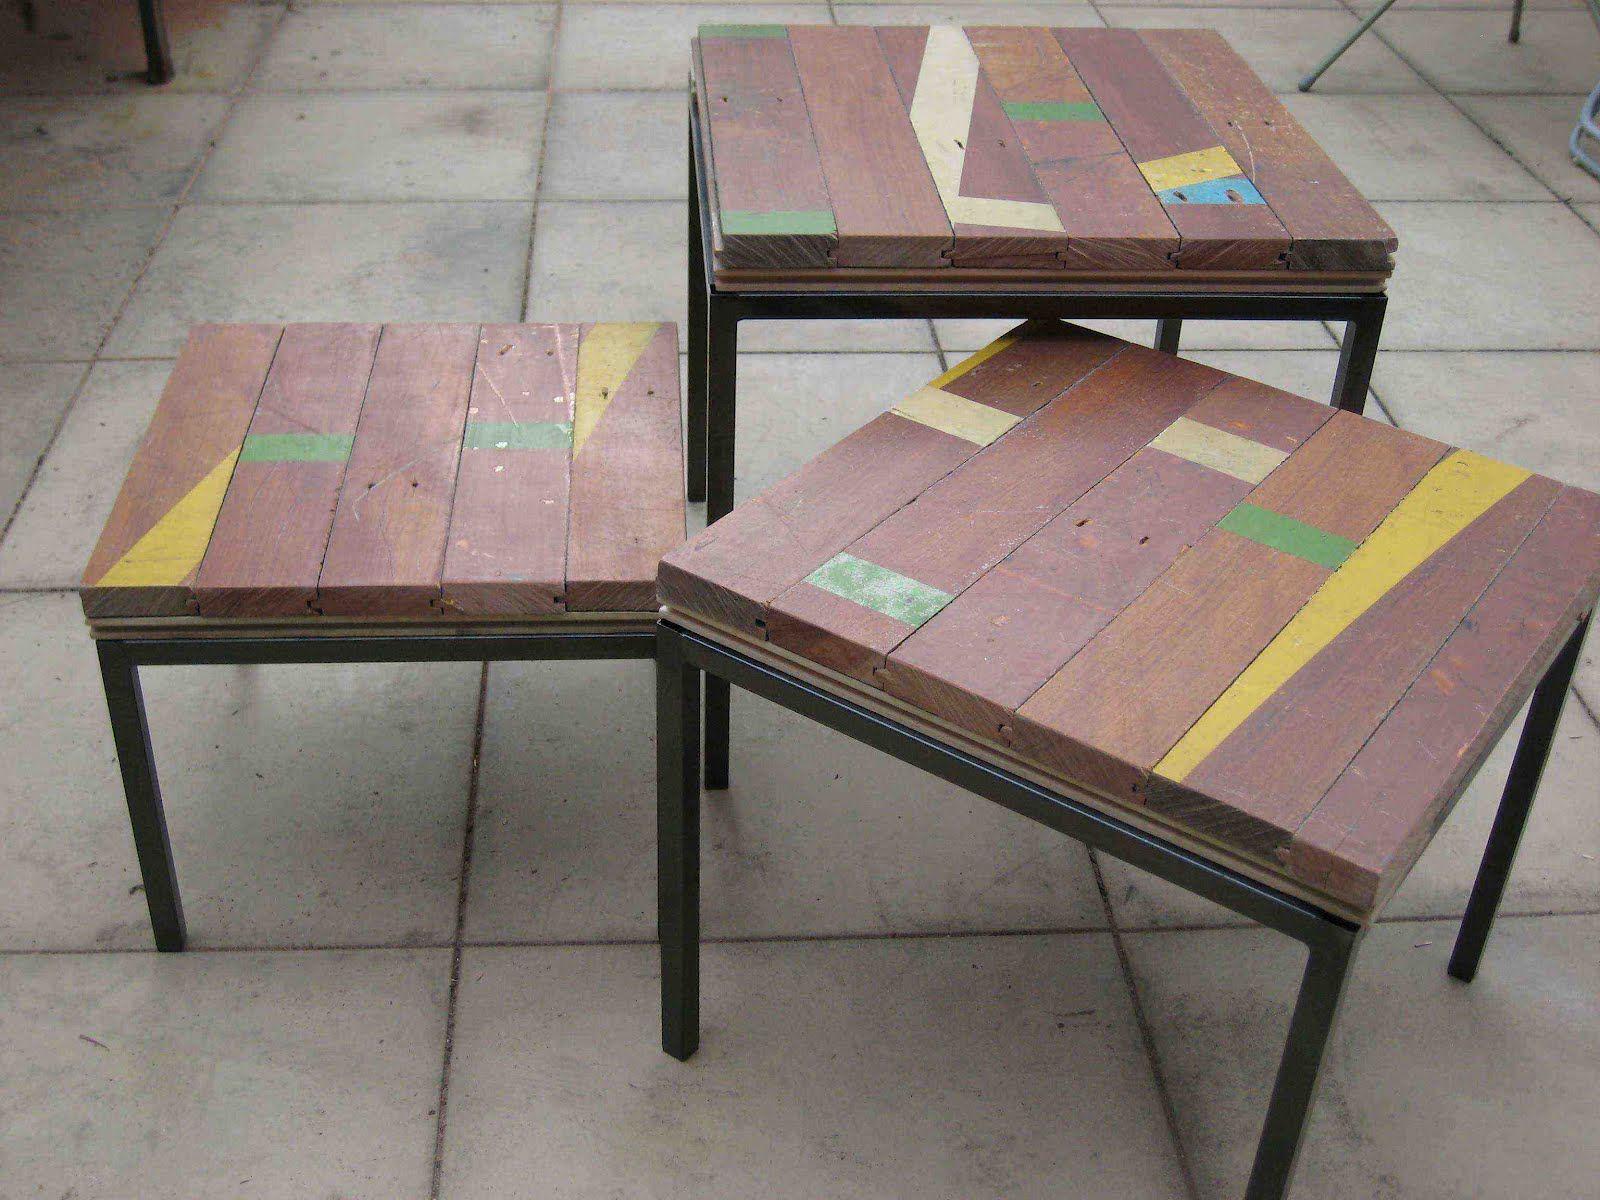 Recycled Timber Vs Basketball Vs Ikea Klubbo  Ikea Hackers